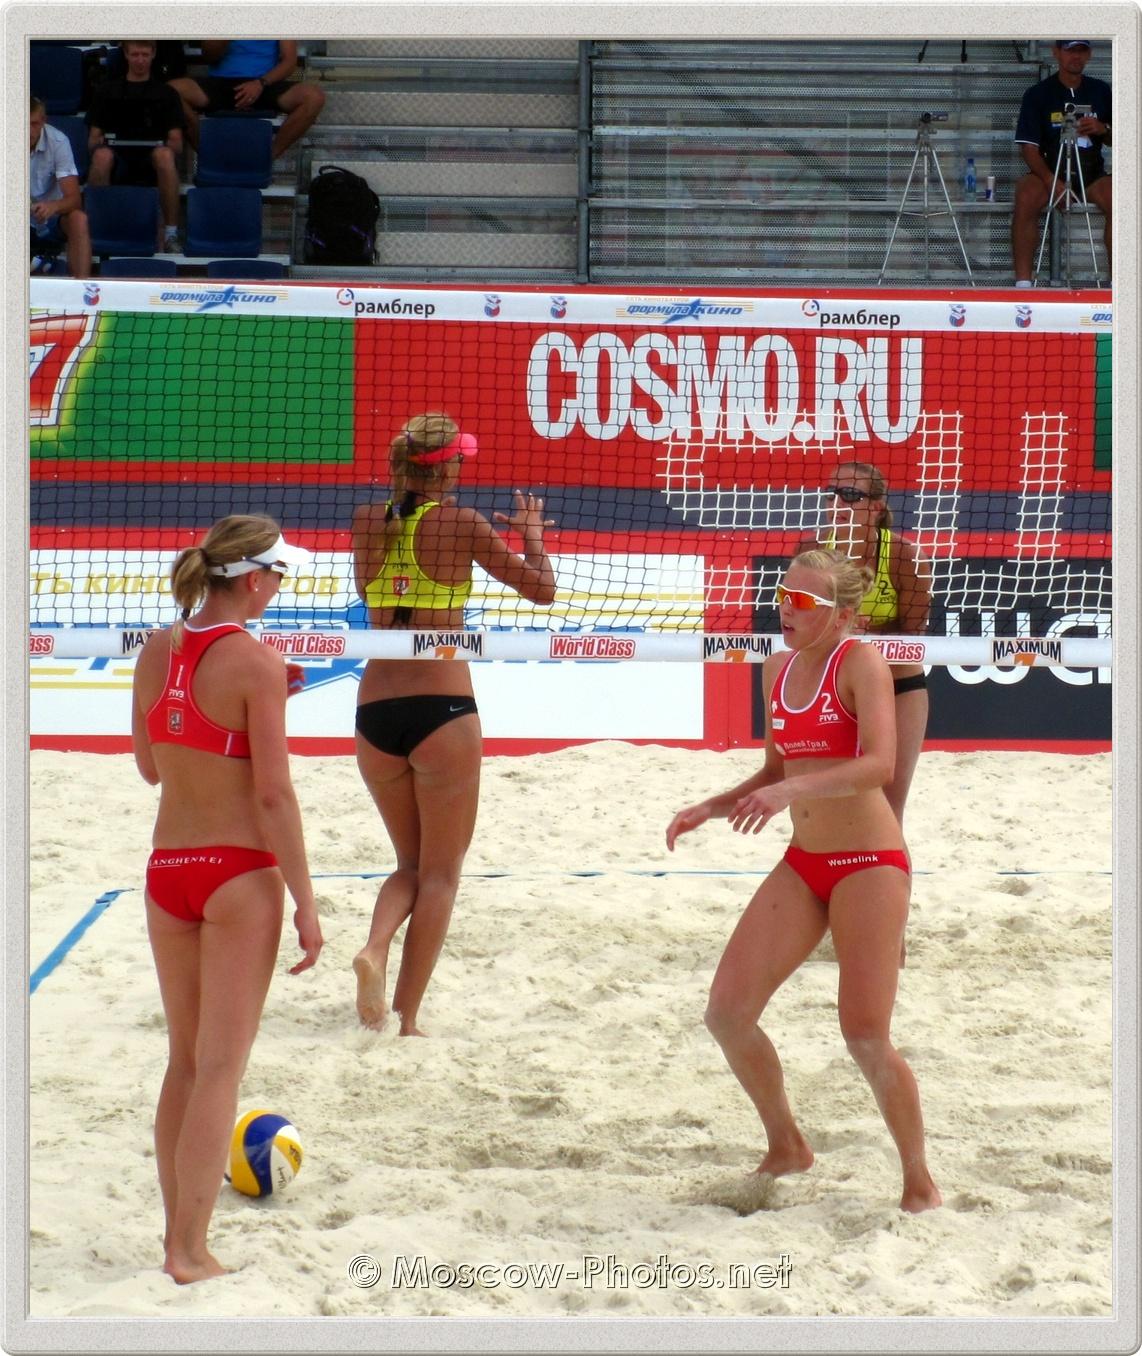 Madelein Meppelink & Marloes Wesselink (NED) vs. Irina Tsimbalova &  Tatyana Mashkova